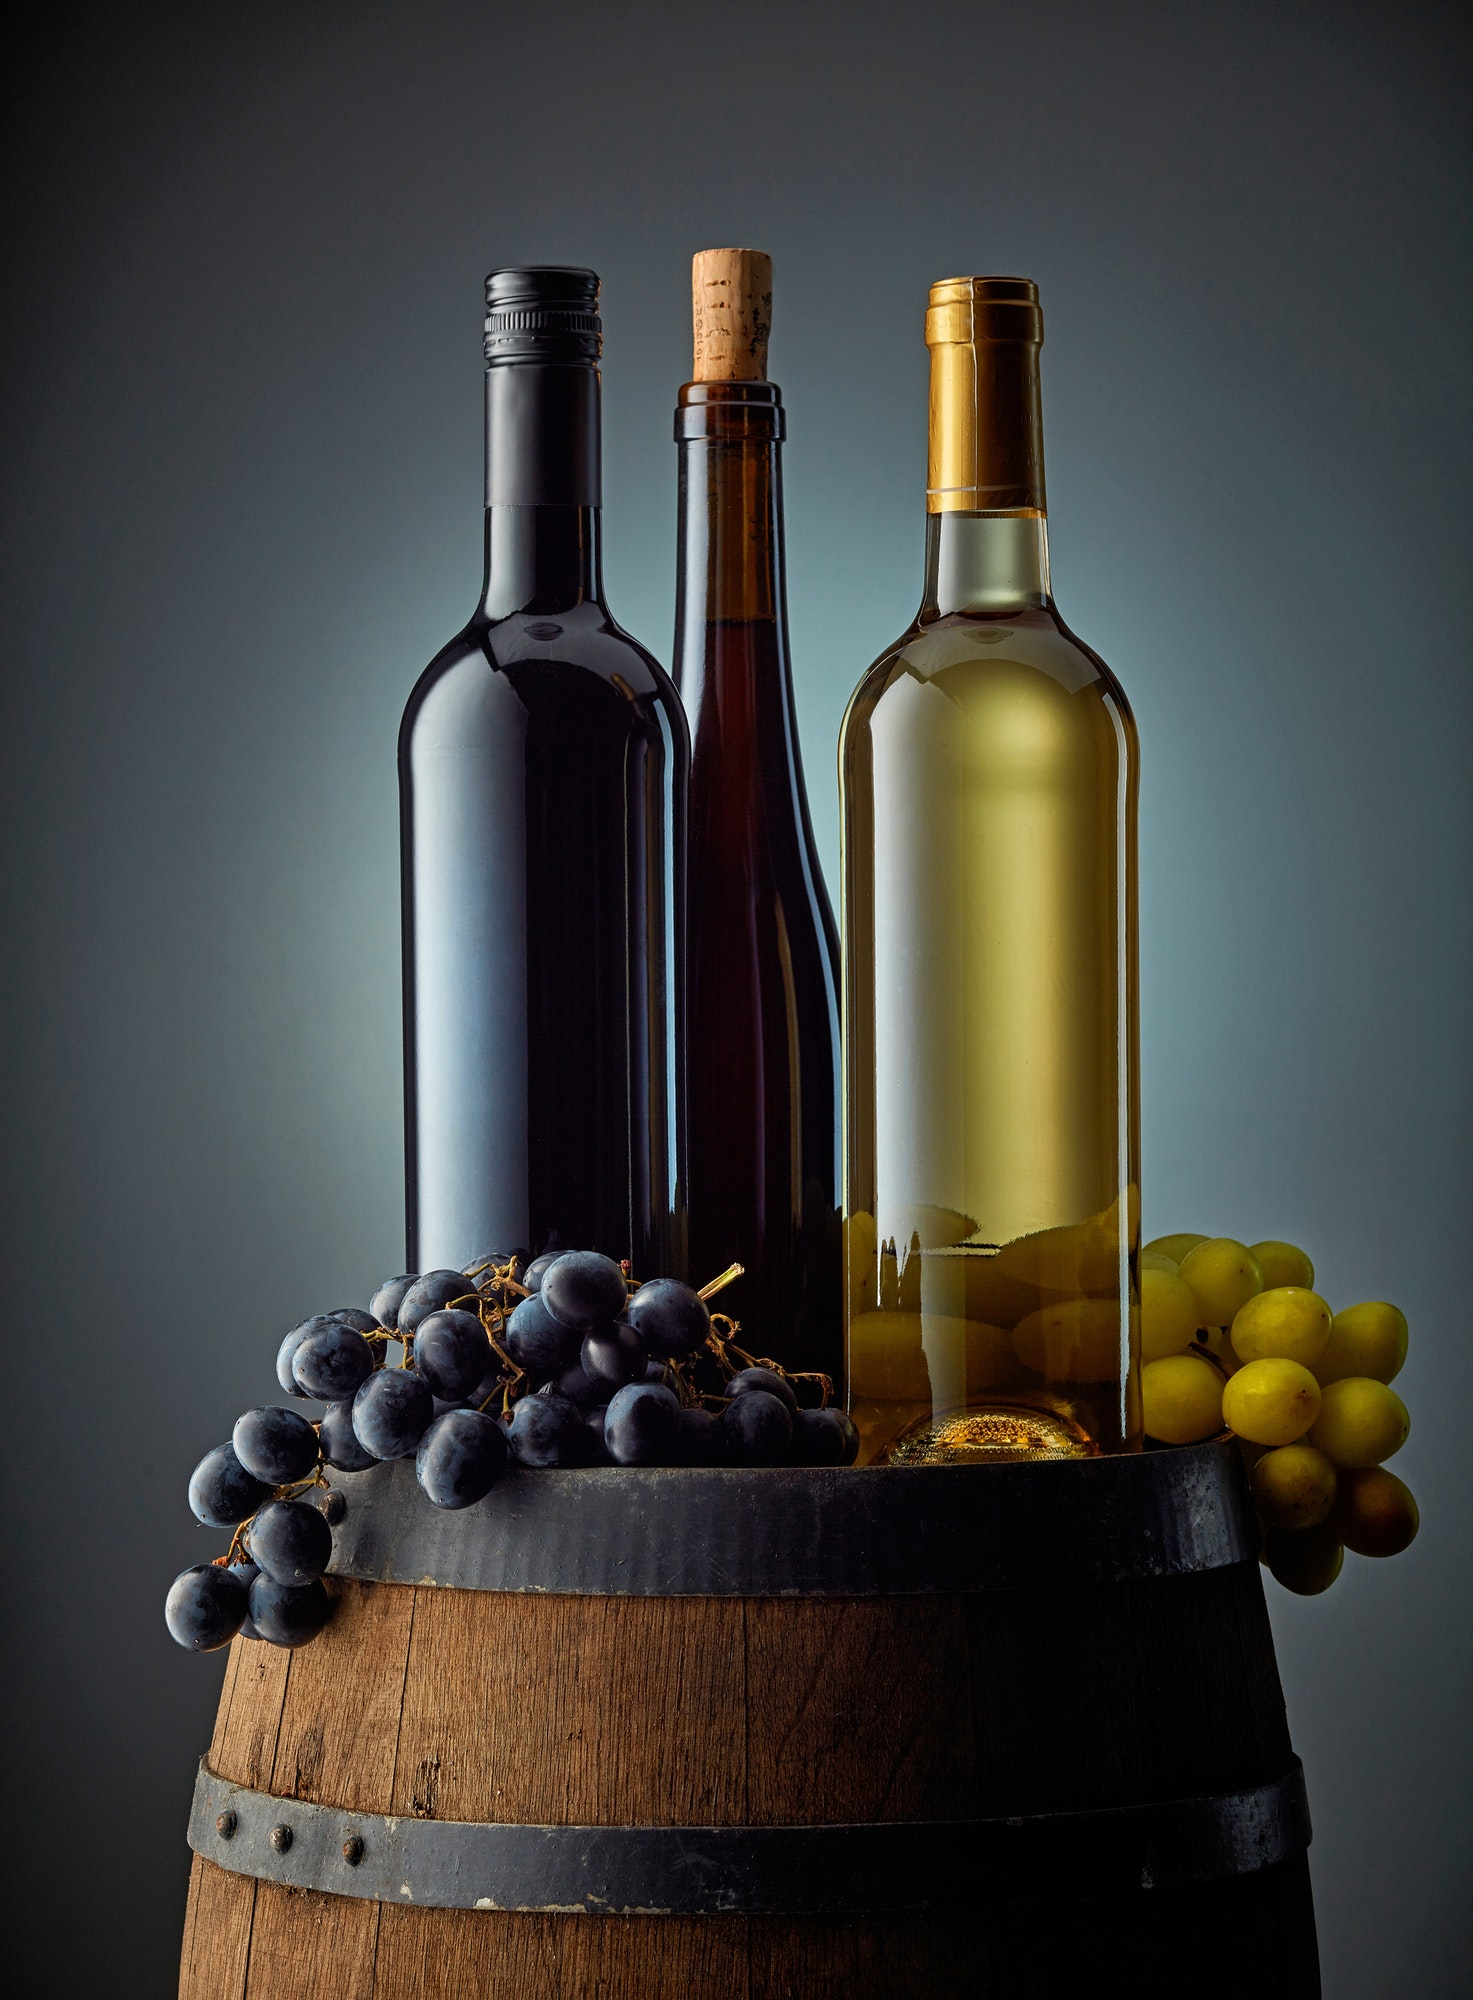 various wine bottles